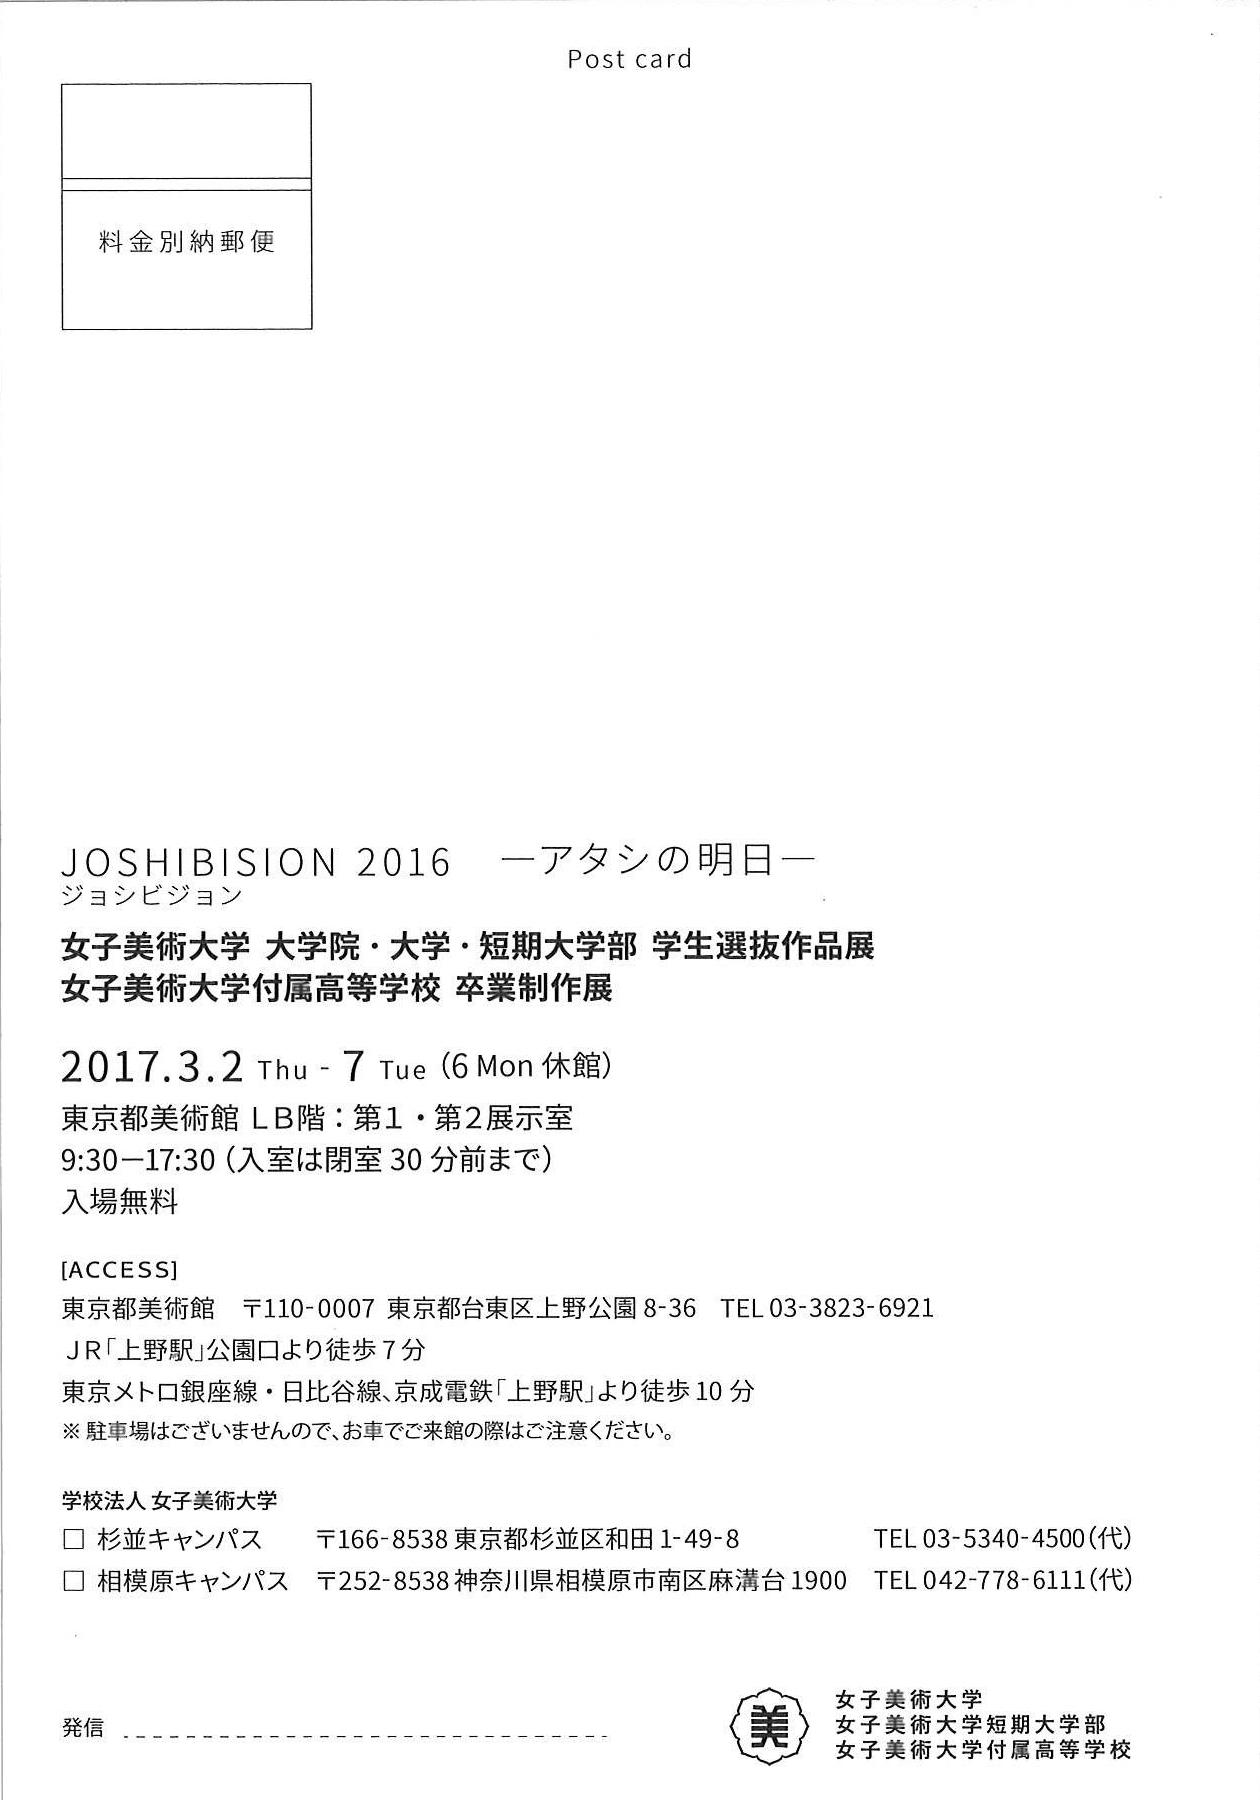 20170228143444_00001